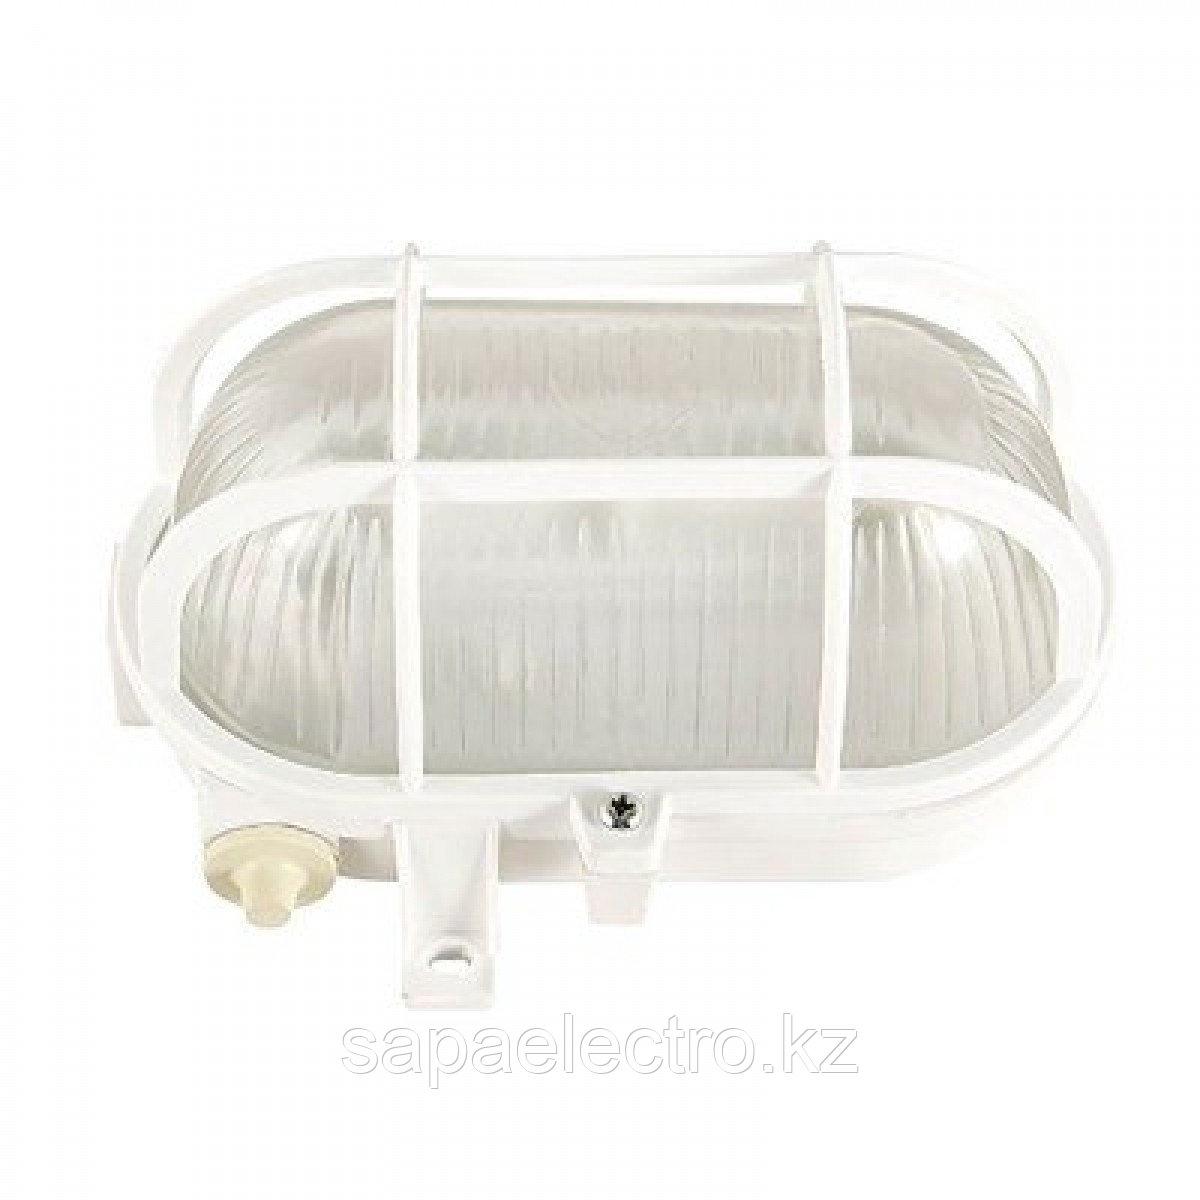 Свет-к L5018 E27 60W WHITE с пласт.решет. (MS)10шт